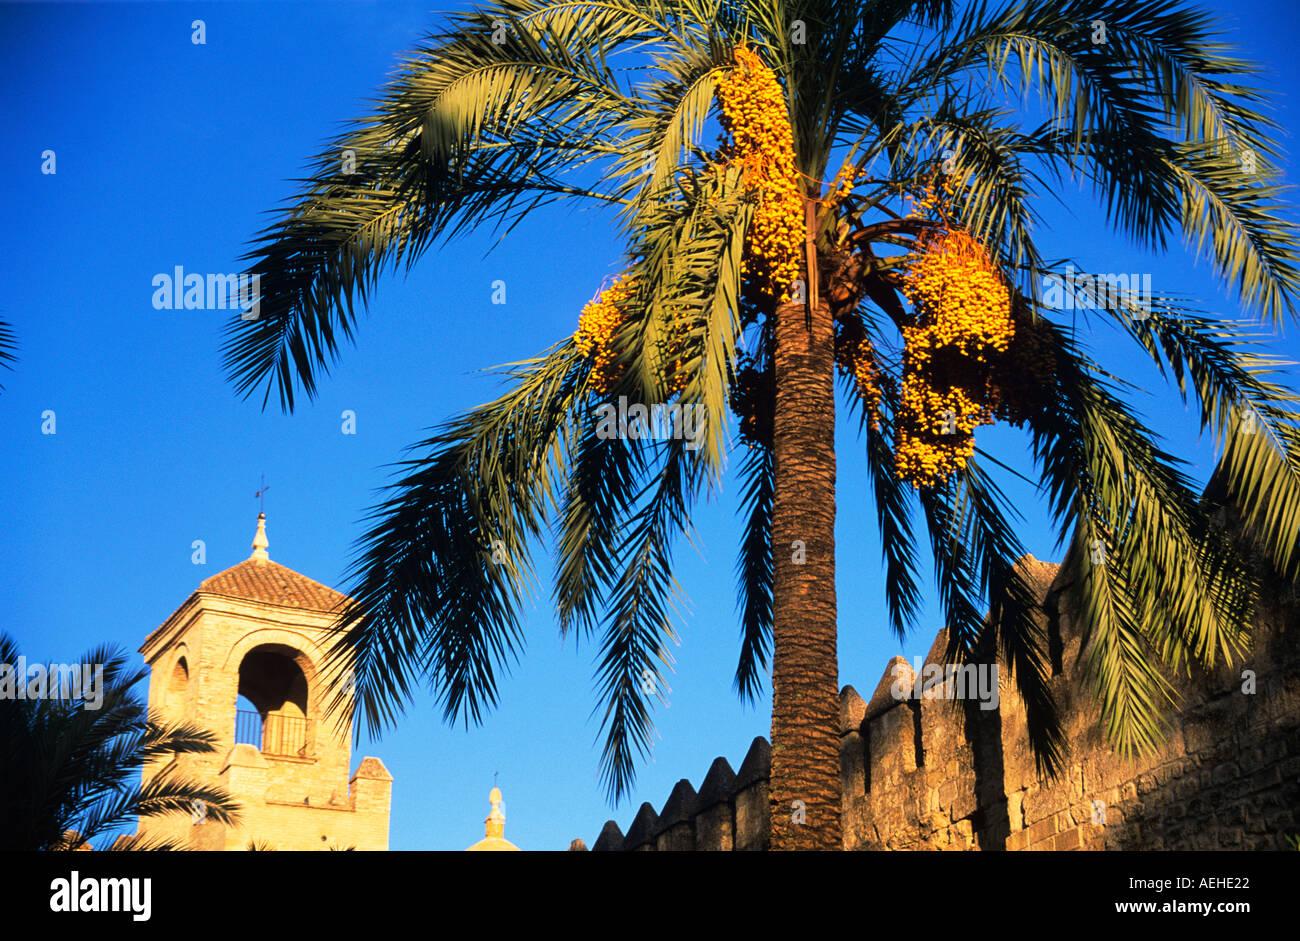 Alcazar de los Reyes Cristianos, Cordoba, Andalucia, Spain. - Stock Image